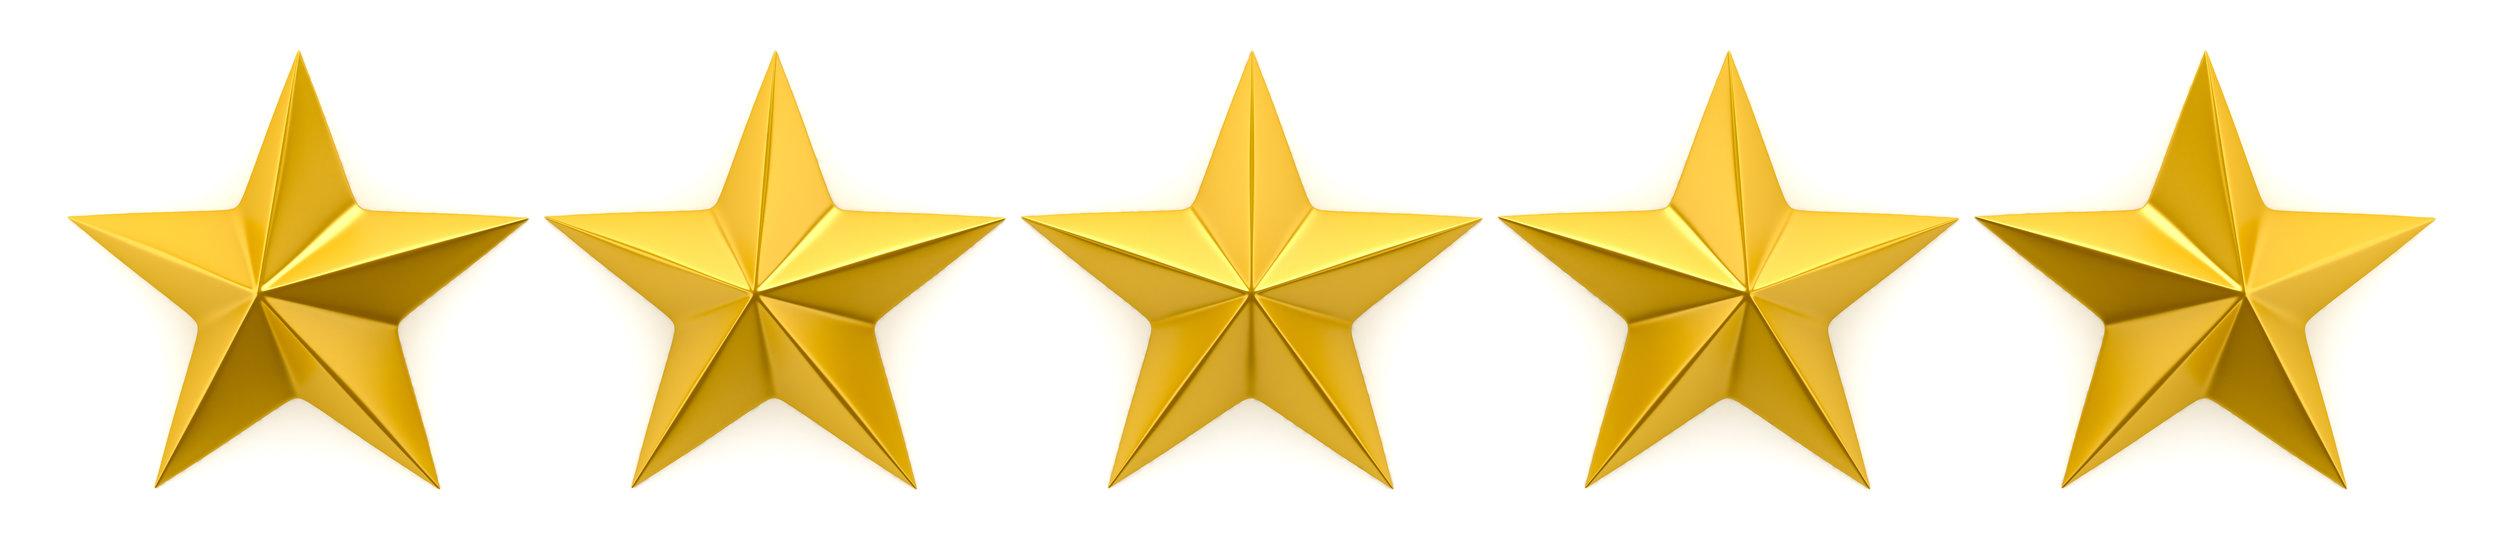 Reviews 5 Star.jpeg